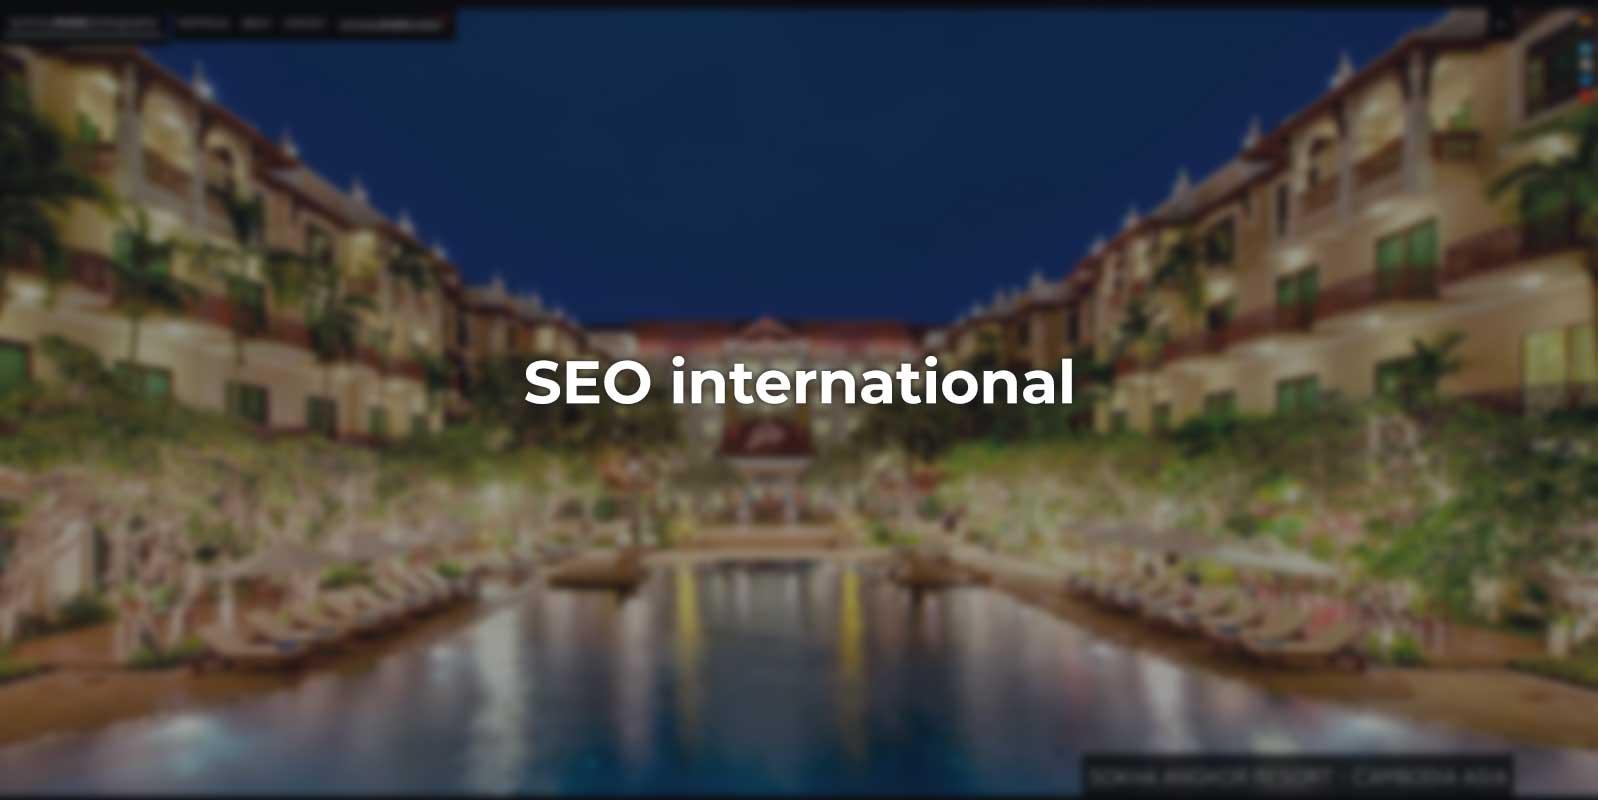 web-xplosion - kostenlose Erstberatung Webdesign - SEO International